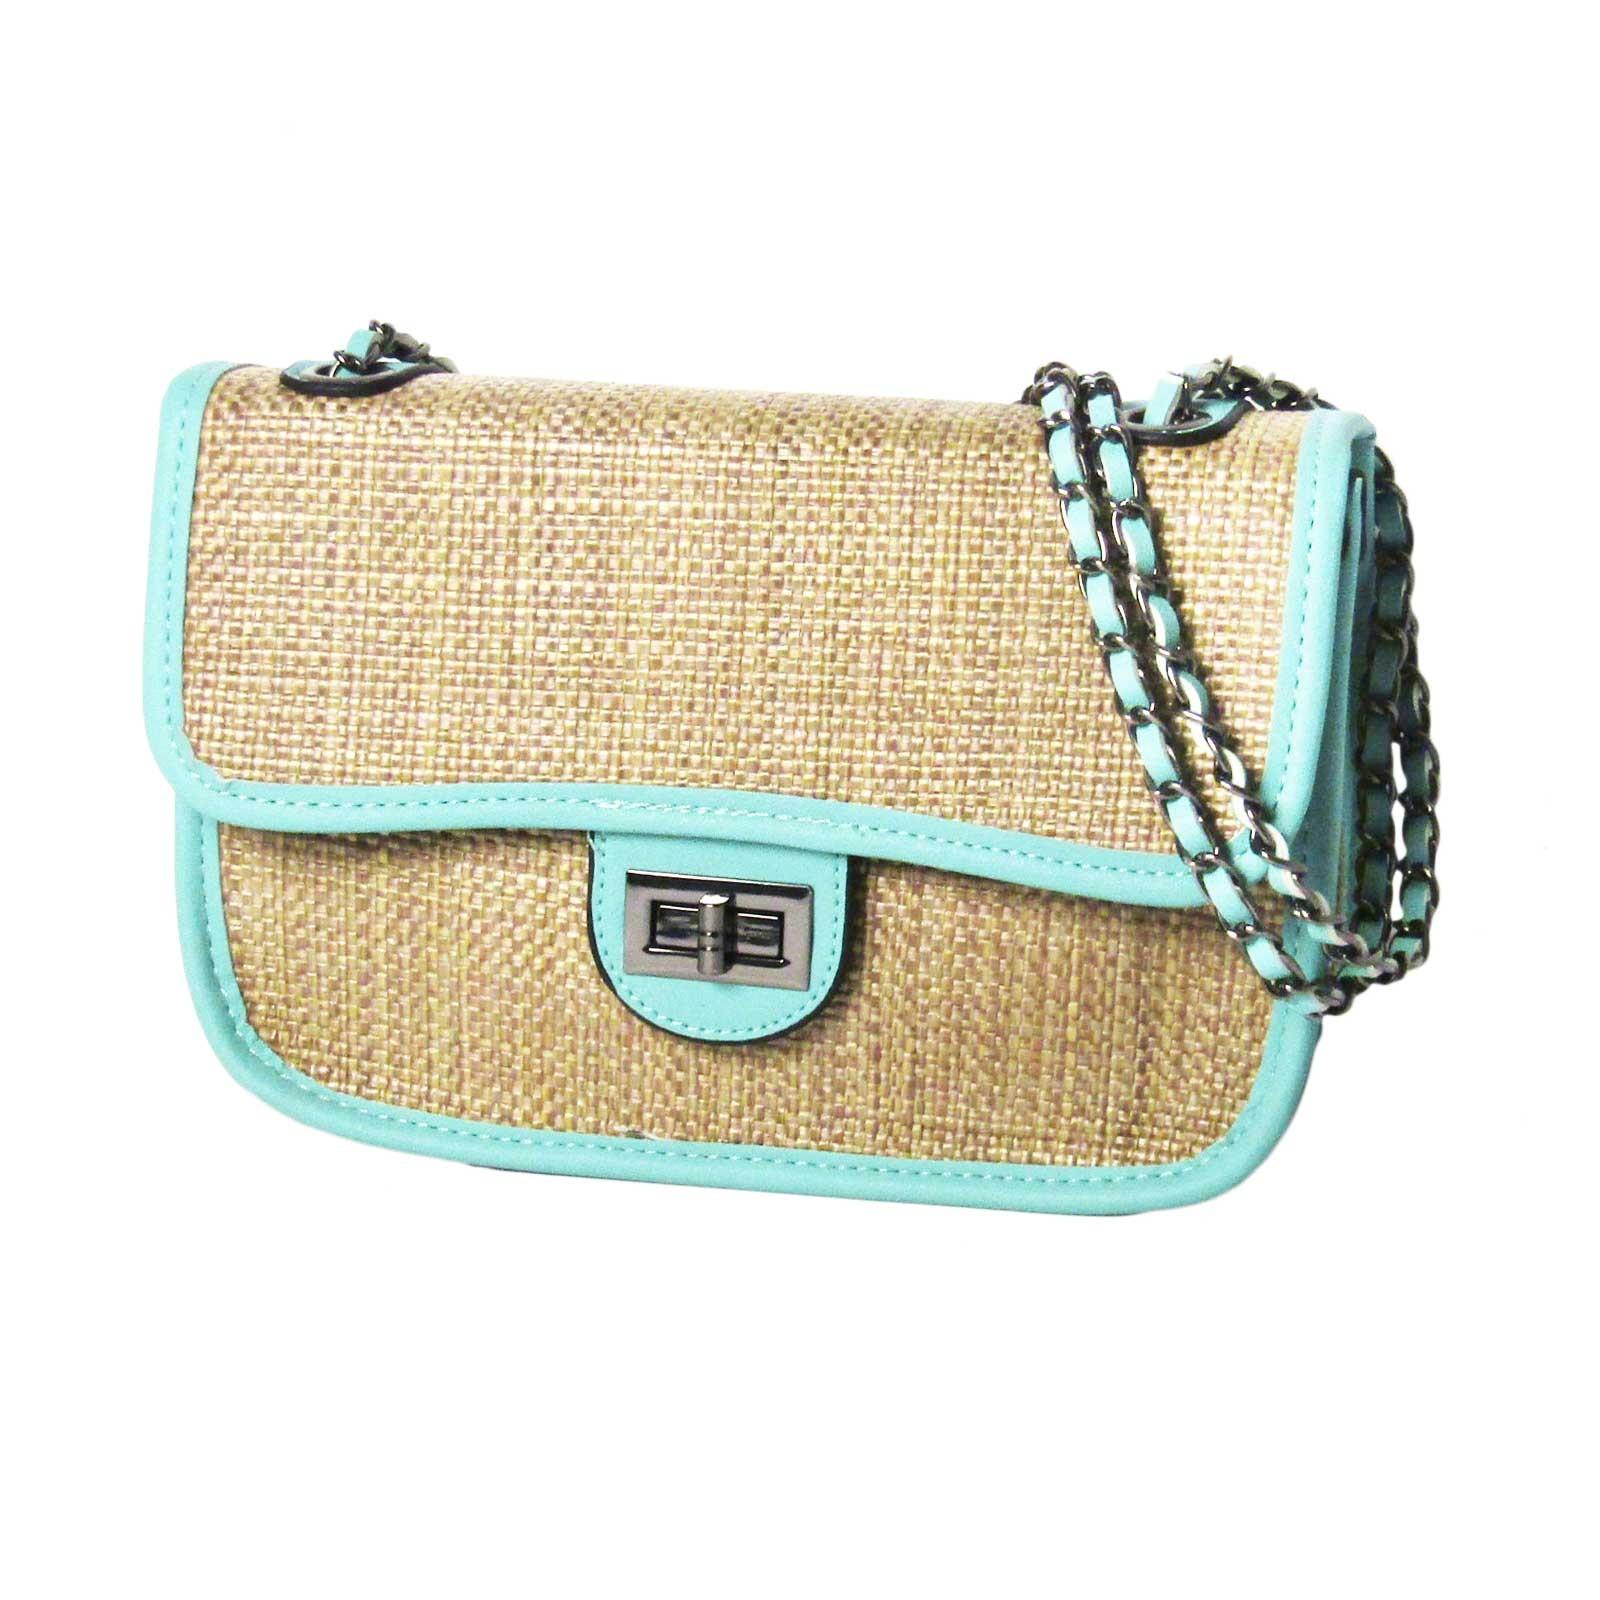 Chic Mint Trim  Double Chain Straw Cross Body Bag